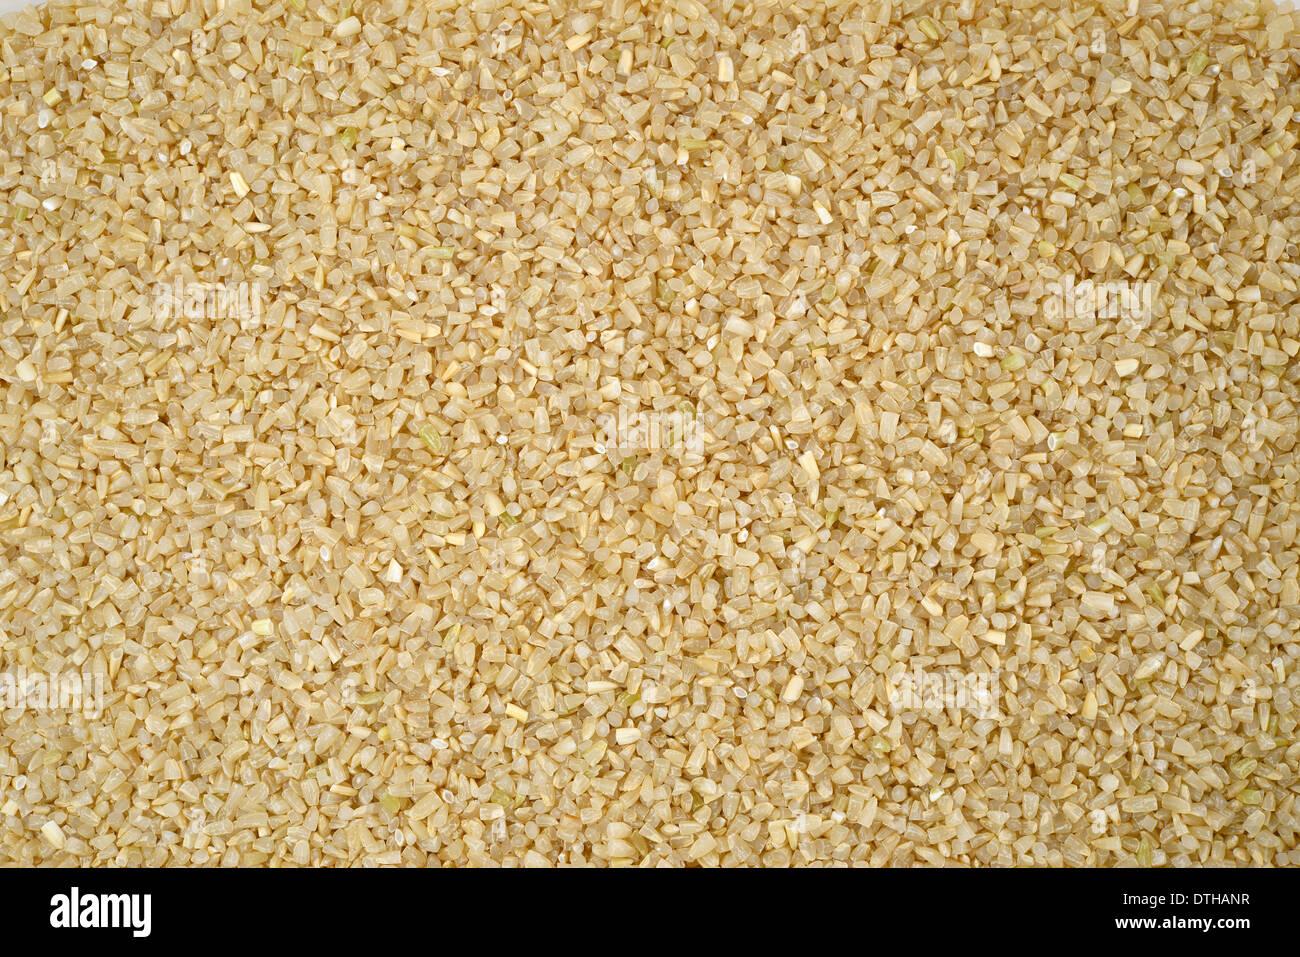 rice germ - Stock Image